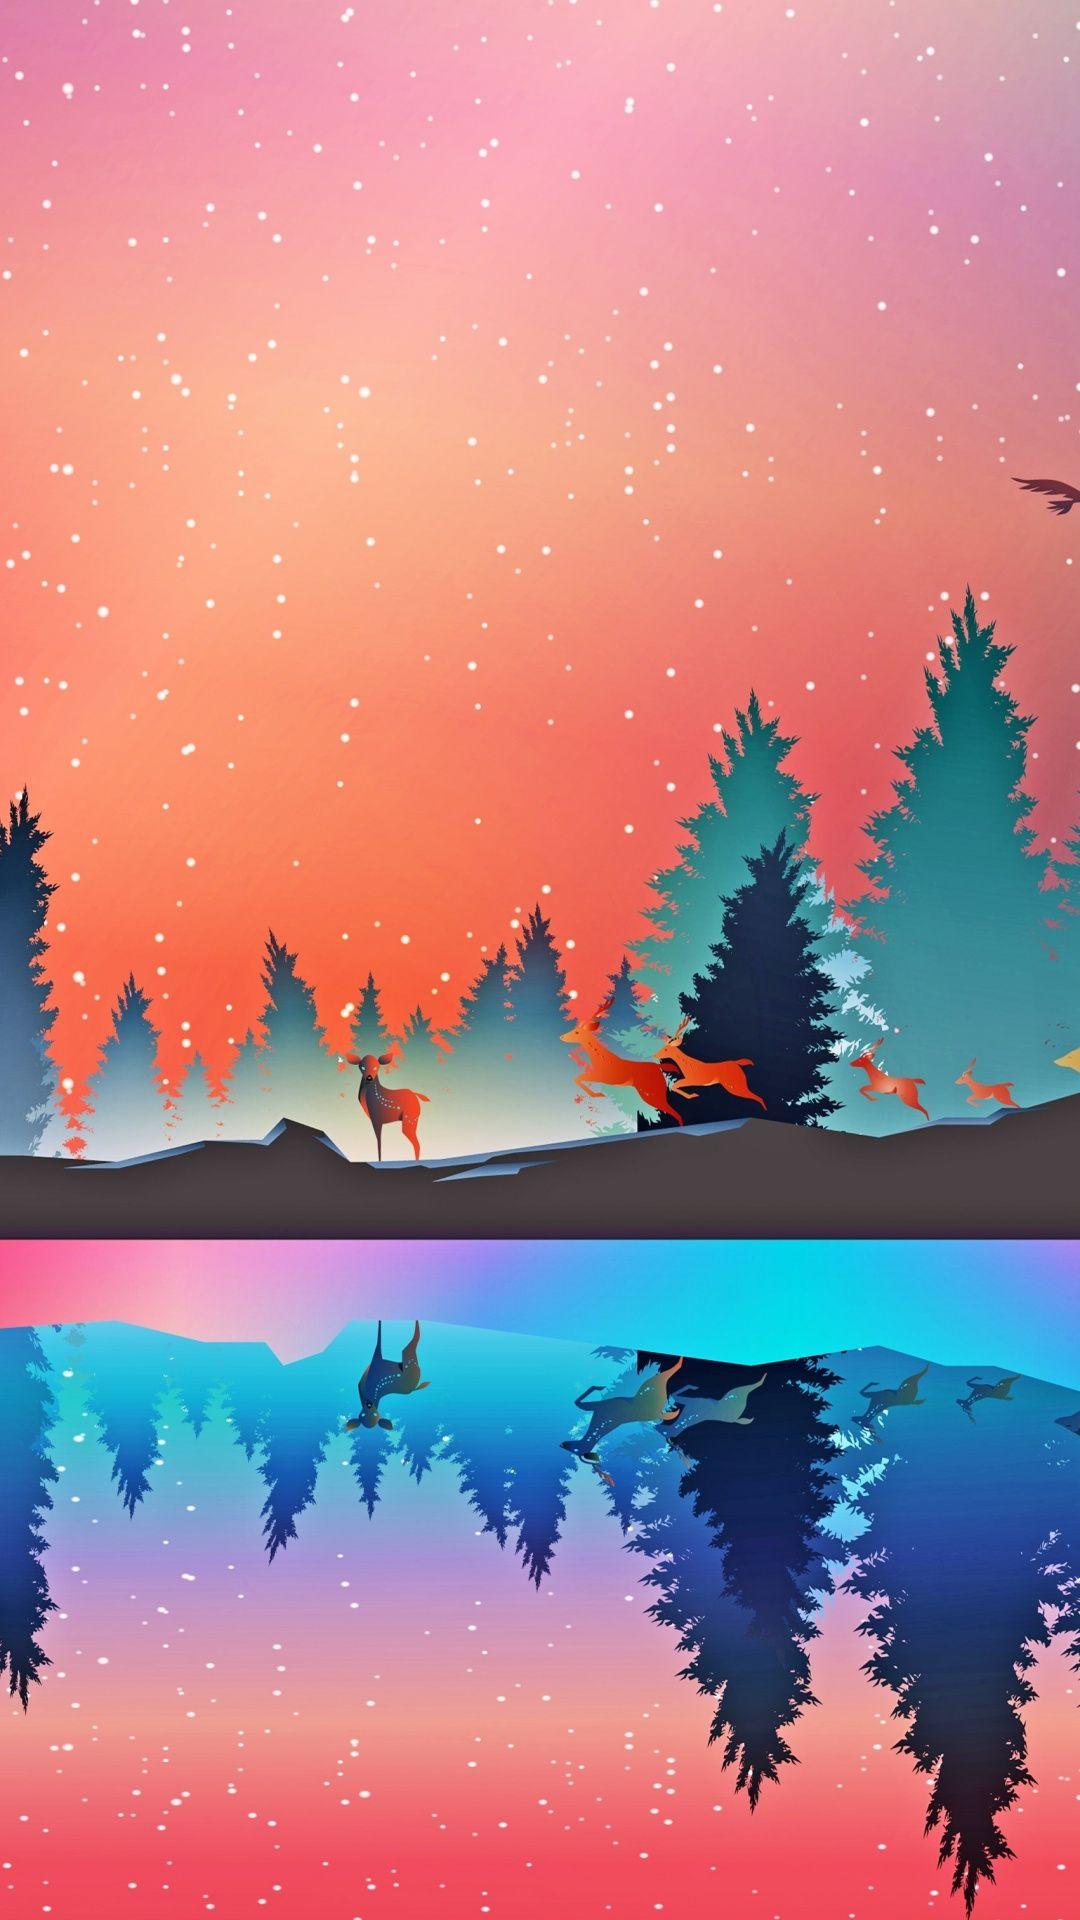 Wildlife Fantasy Deer Lake Reflections Digital Art 1080x1920